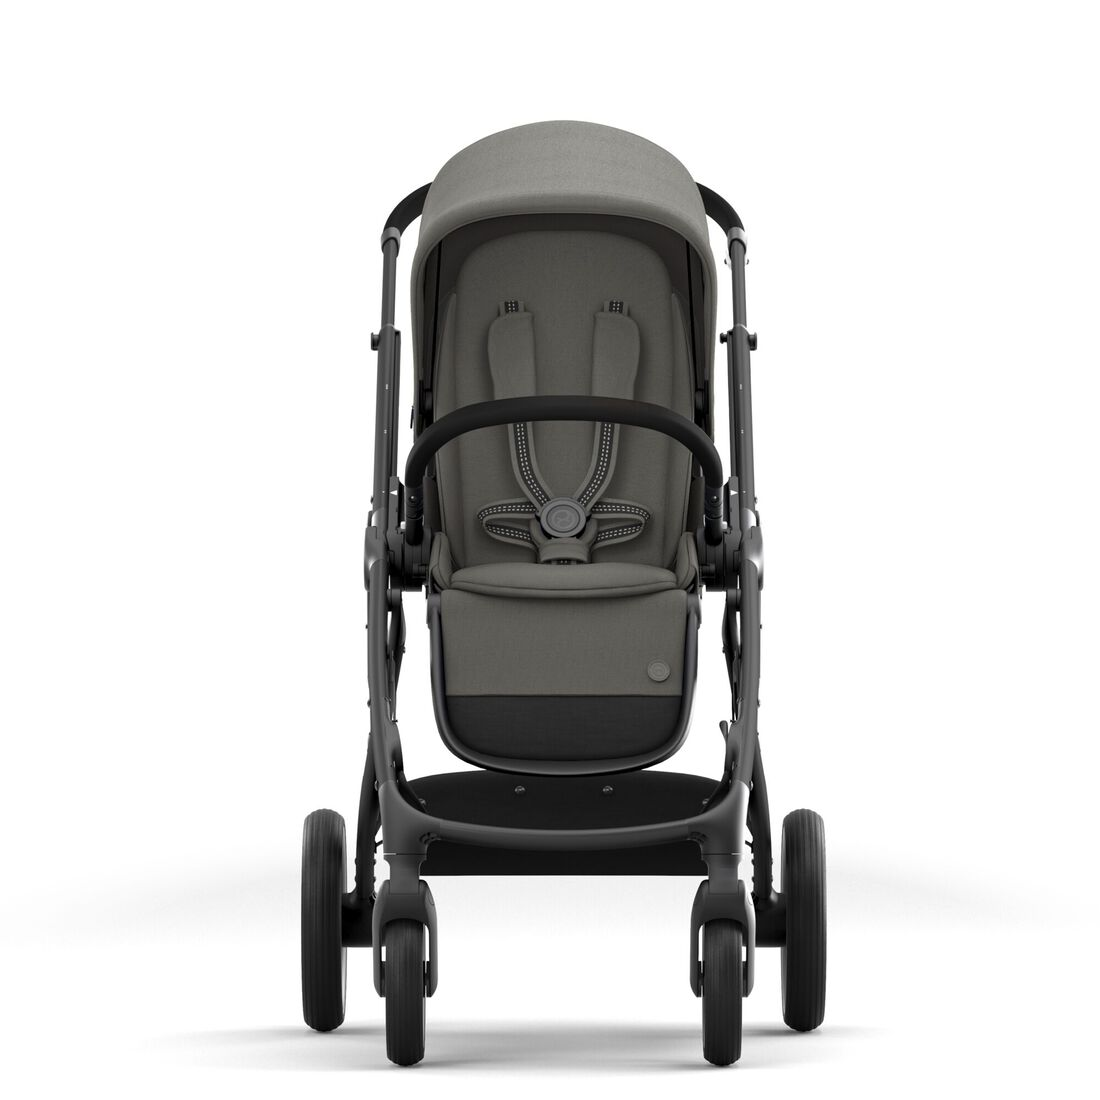 CYBEX Gazelle S - Soho Grey (Schwarzer Rahmen) in Soho Grey (Black Frame) large Bild 5